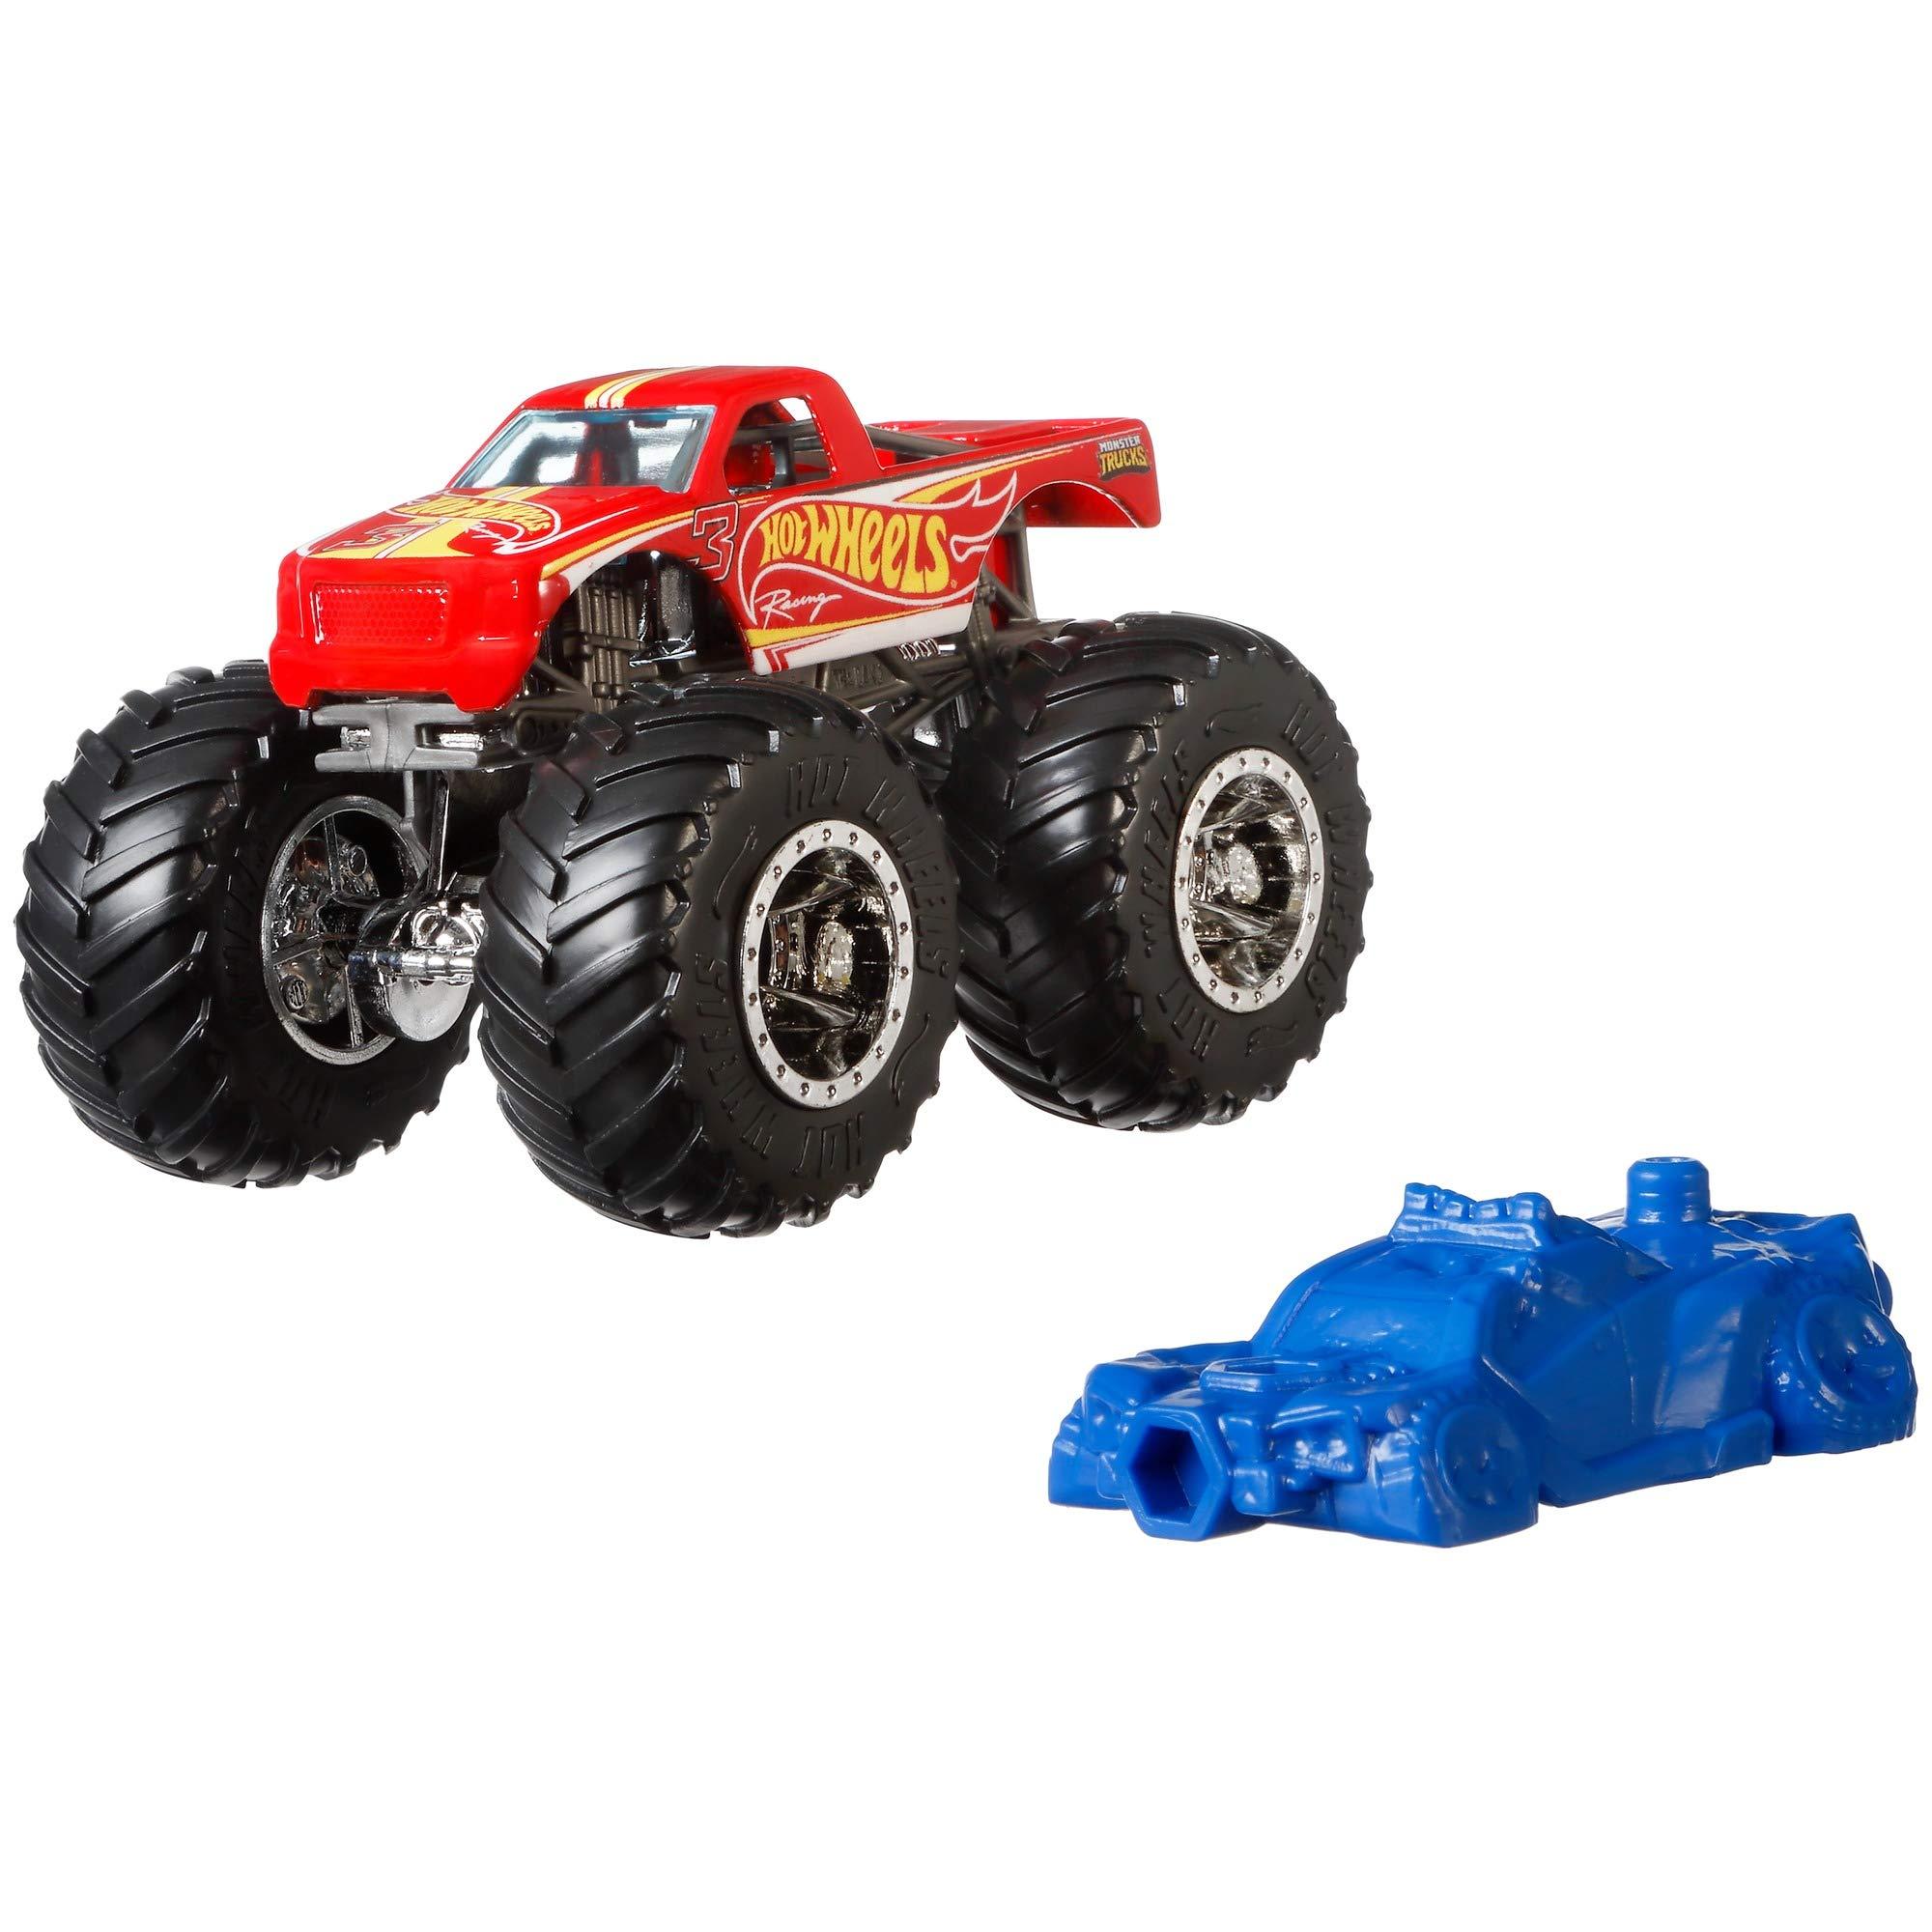 Hot Wheels GJY15 Monster Trucks 1:64 Scale Die-Cast Vehicle Racing 3, Multicolour